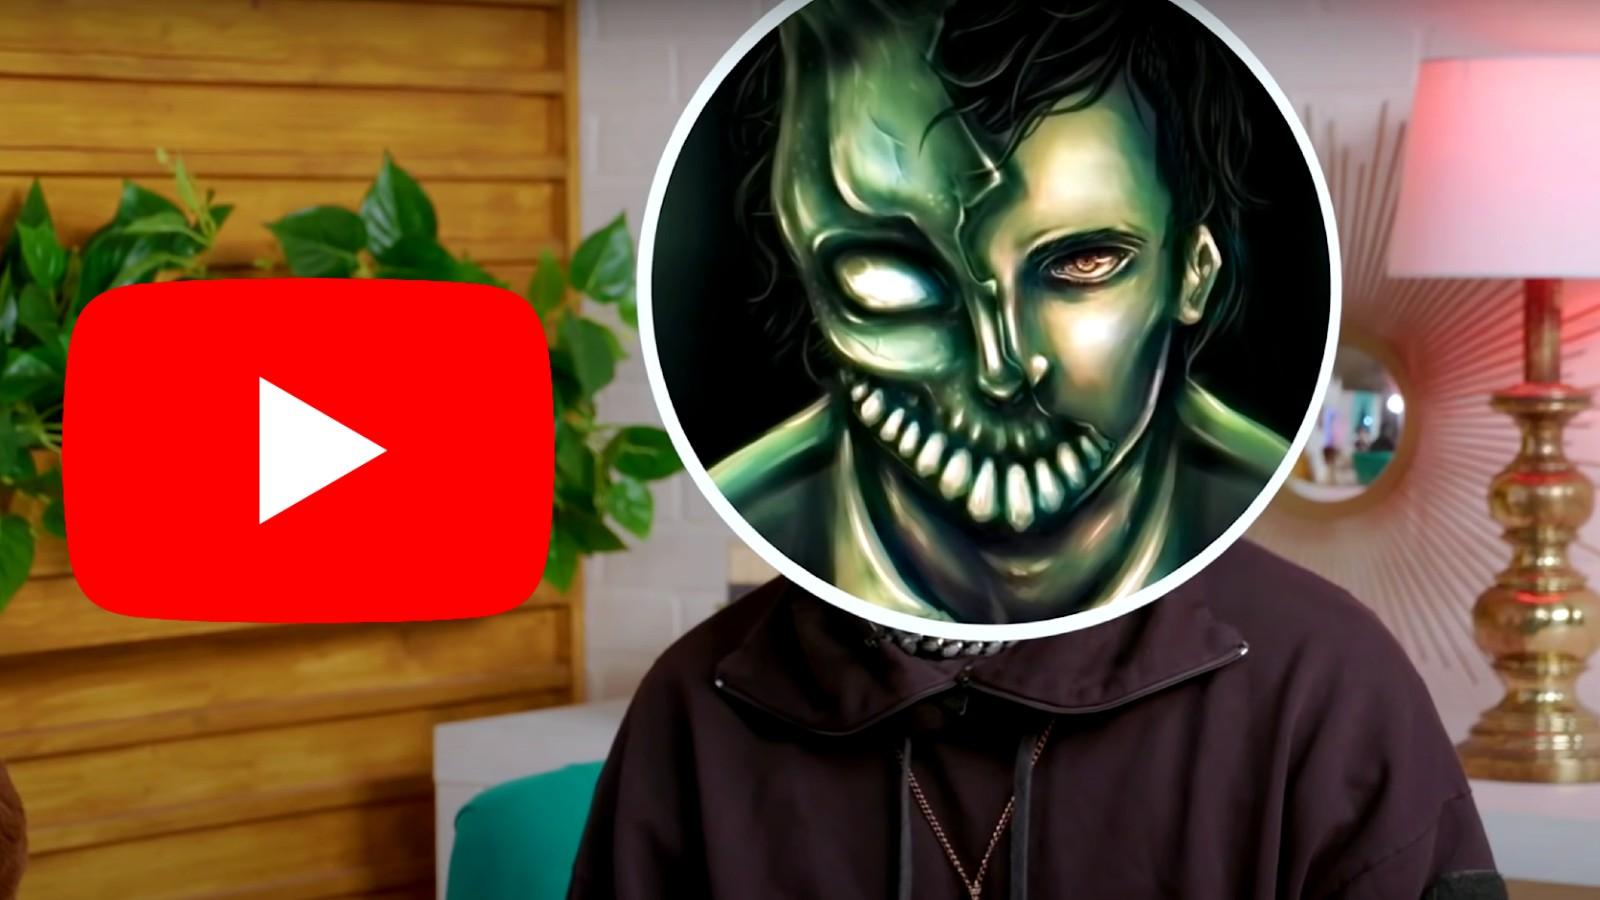 Corpse Husband's avatar next to the YouTube logo